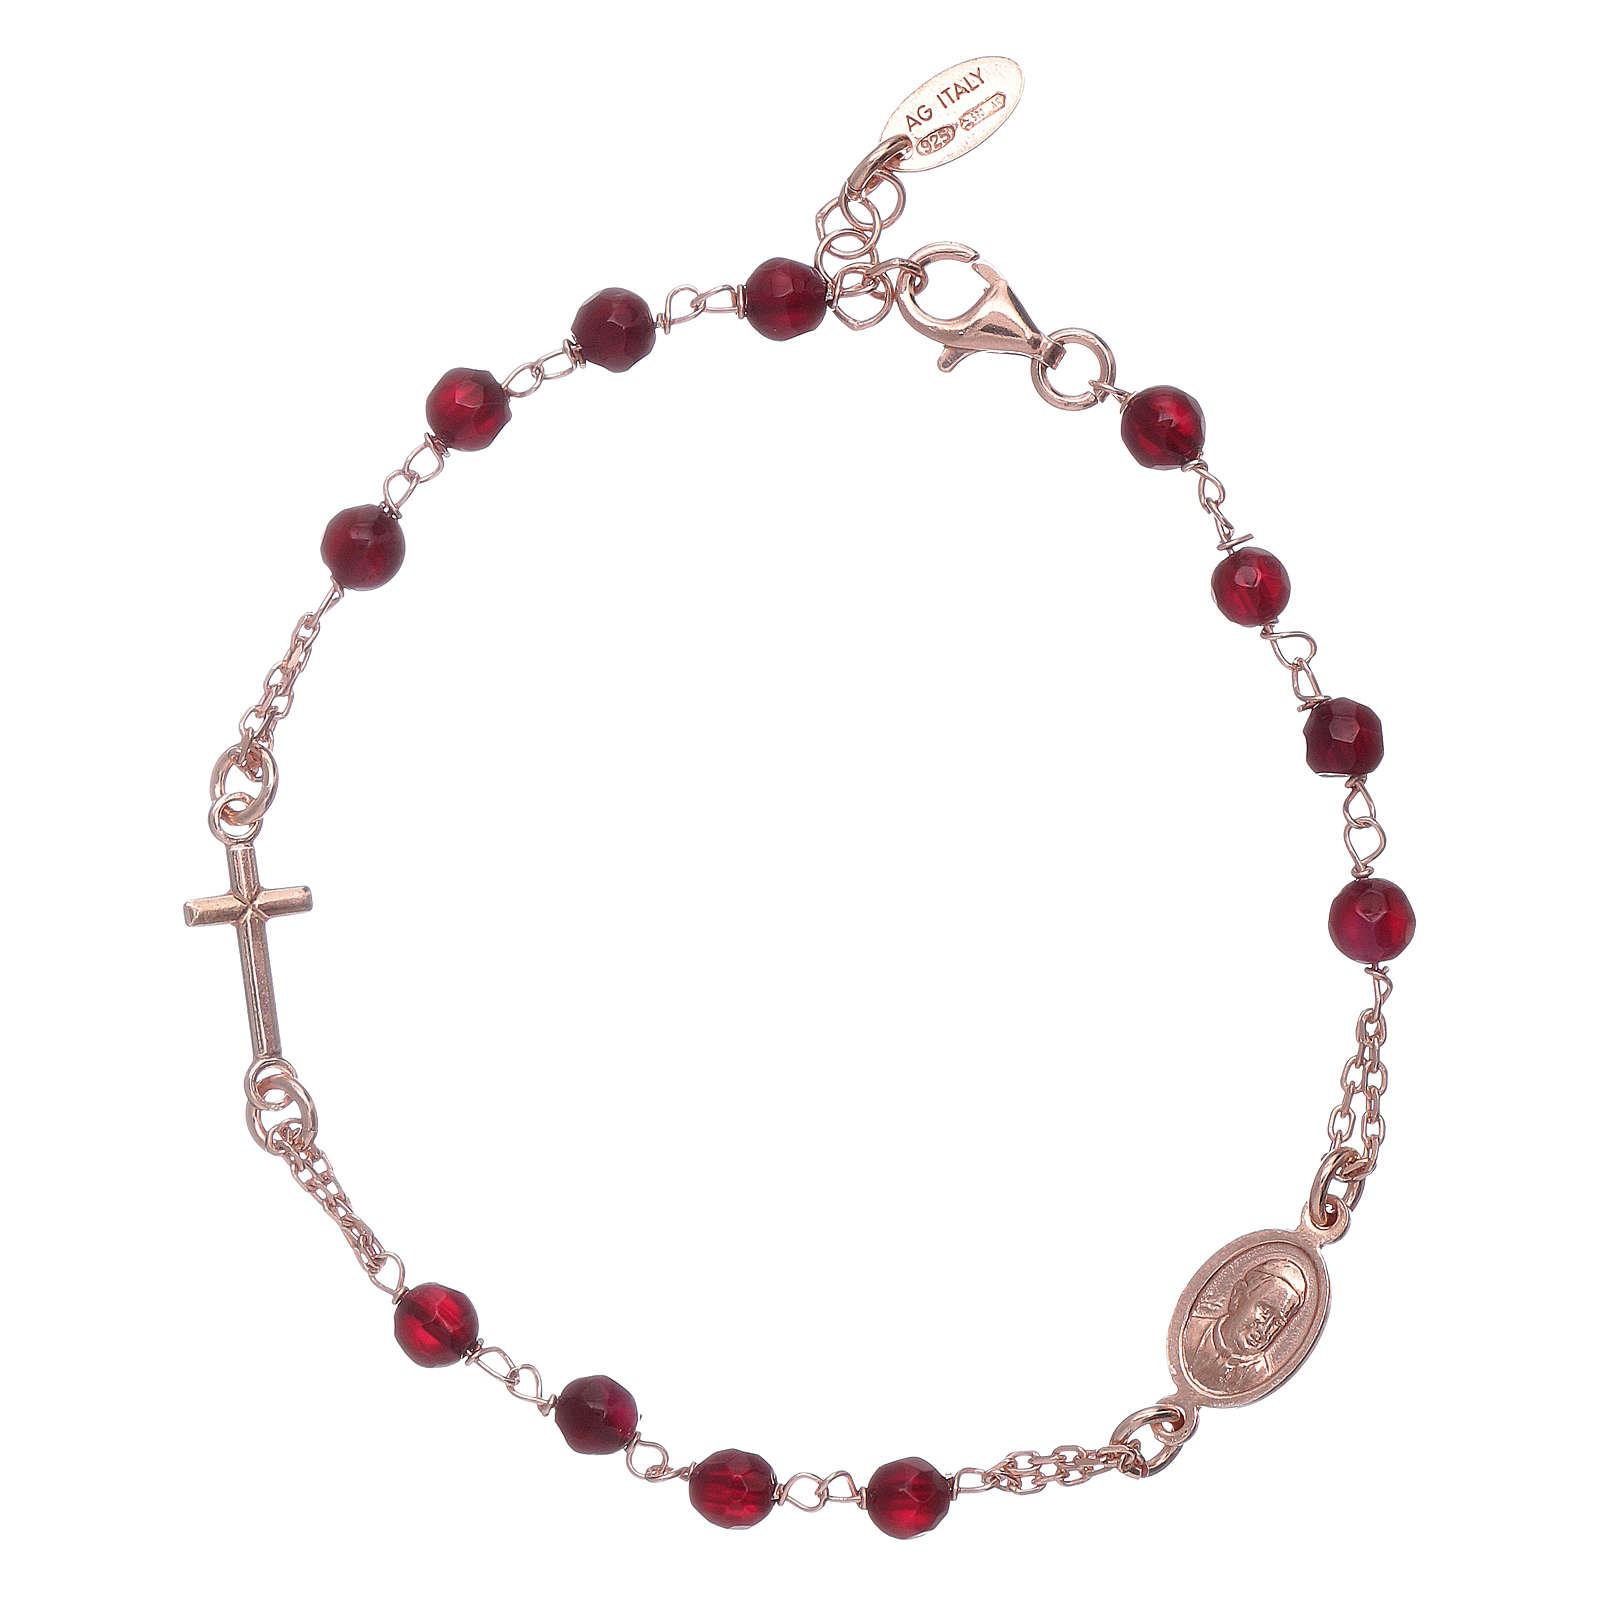 bf1072a4d0a Pulsera rosario plata 925 AMEN perlas ágata rubí 4